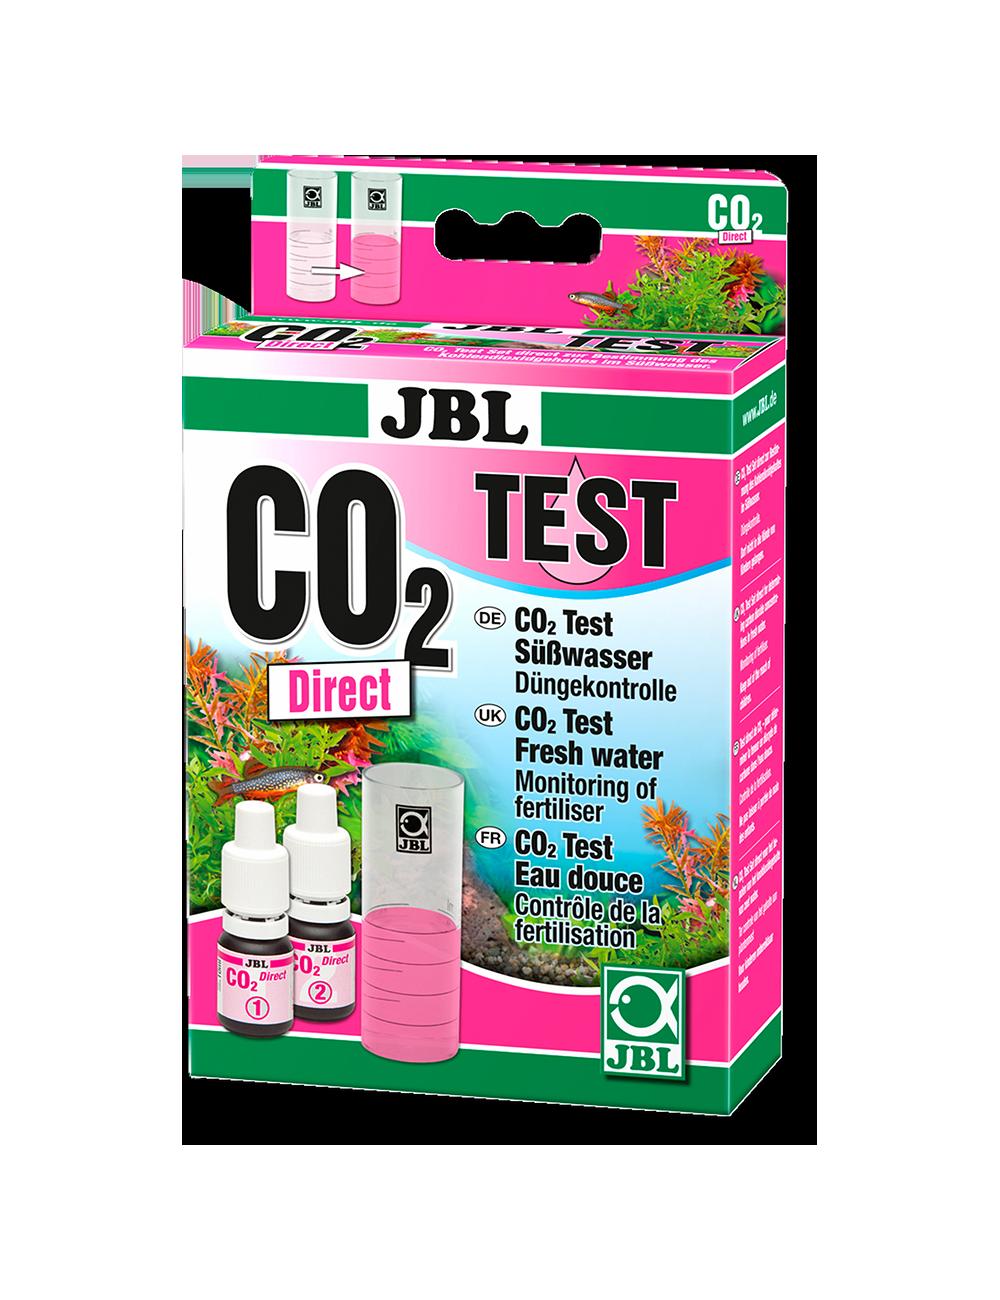 JBL - Test CO2 Direct